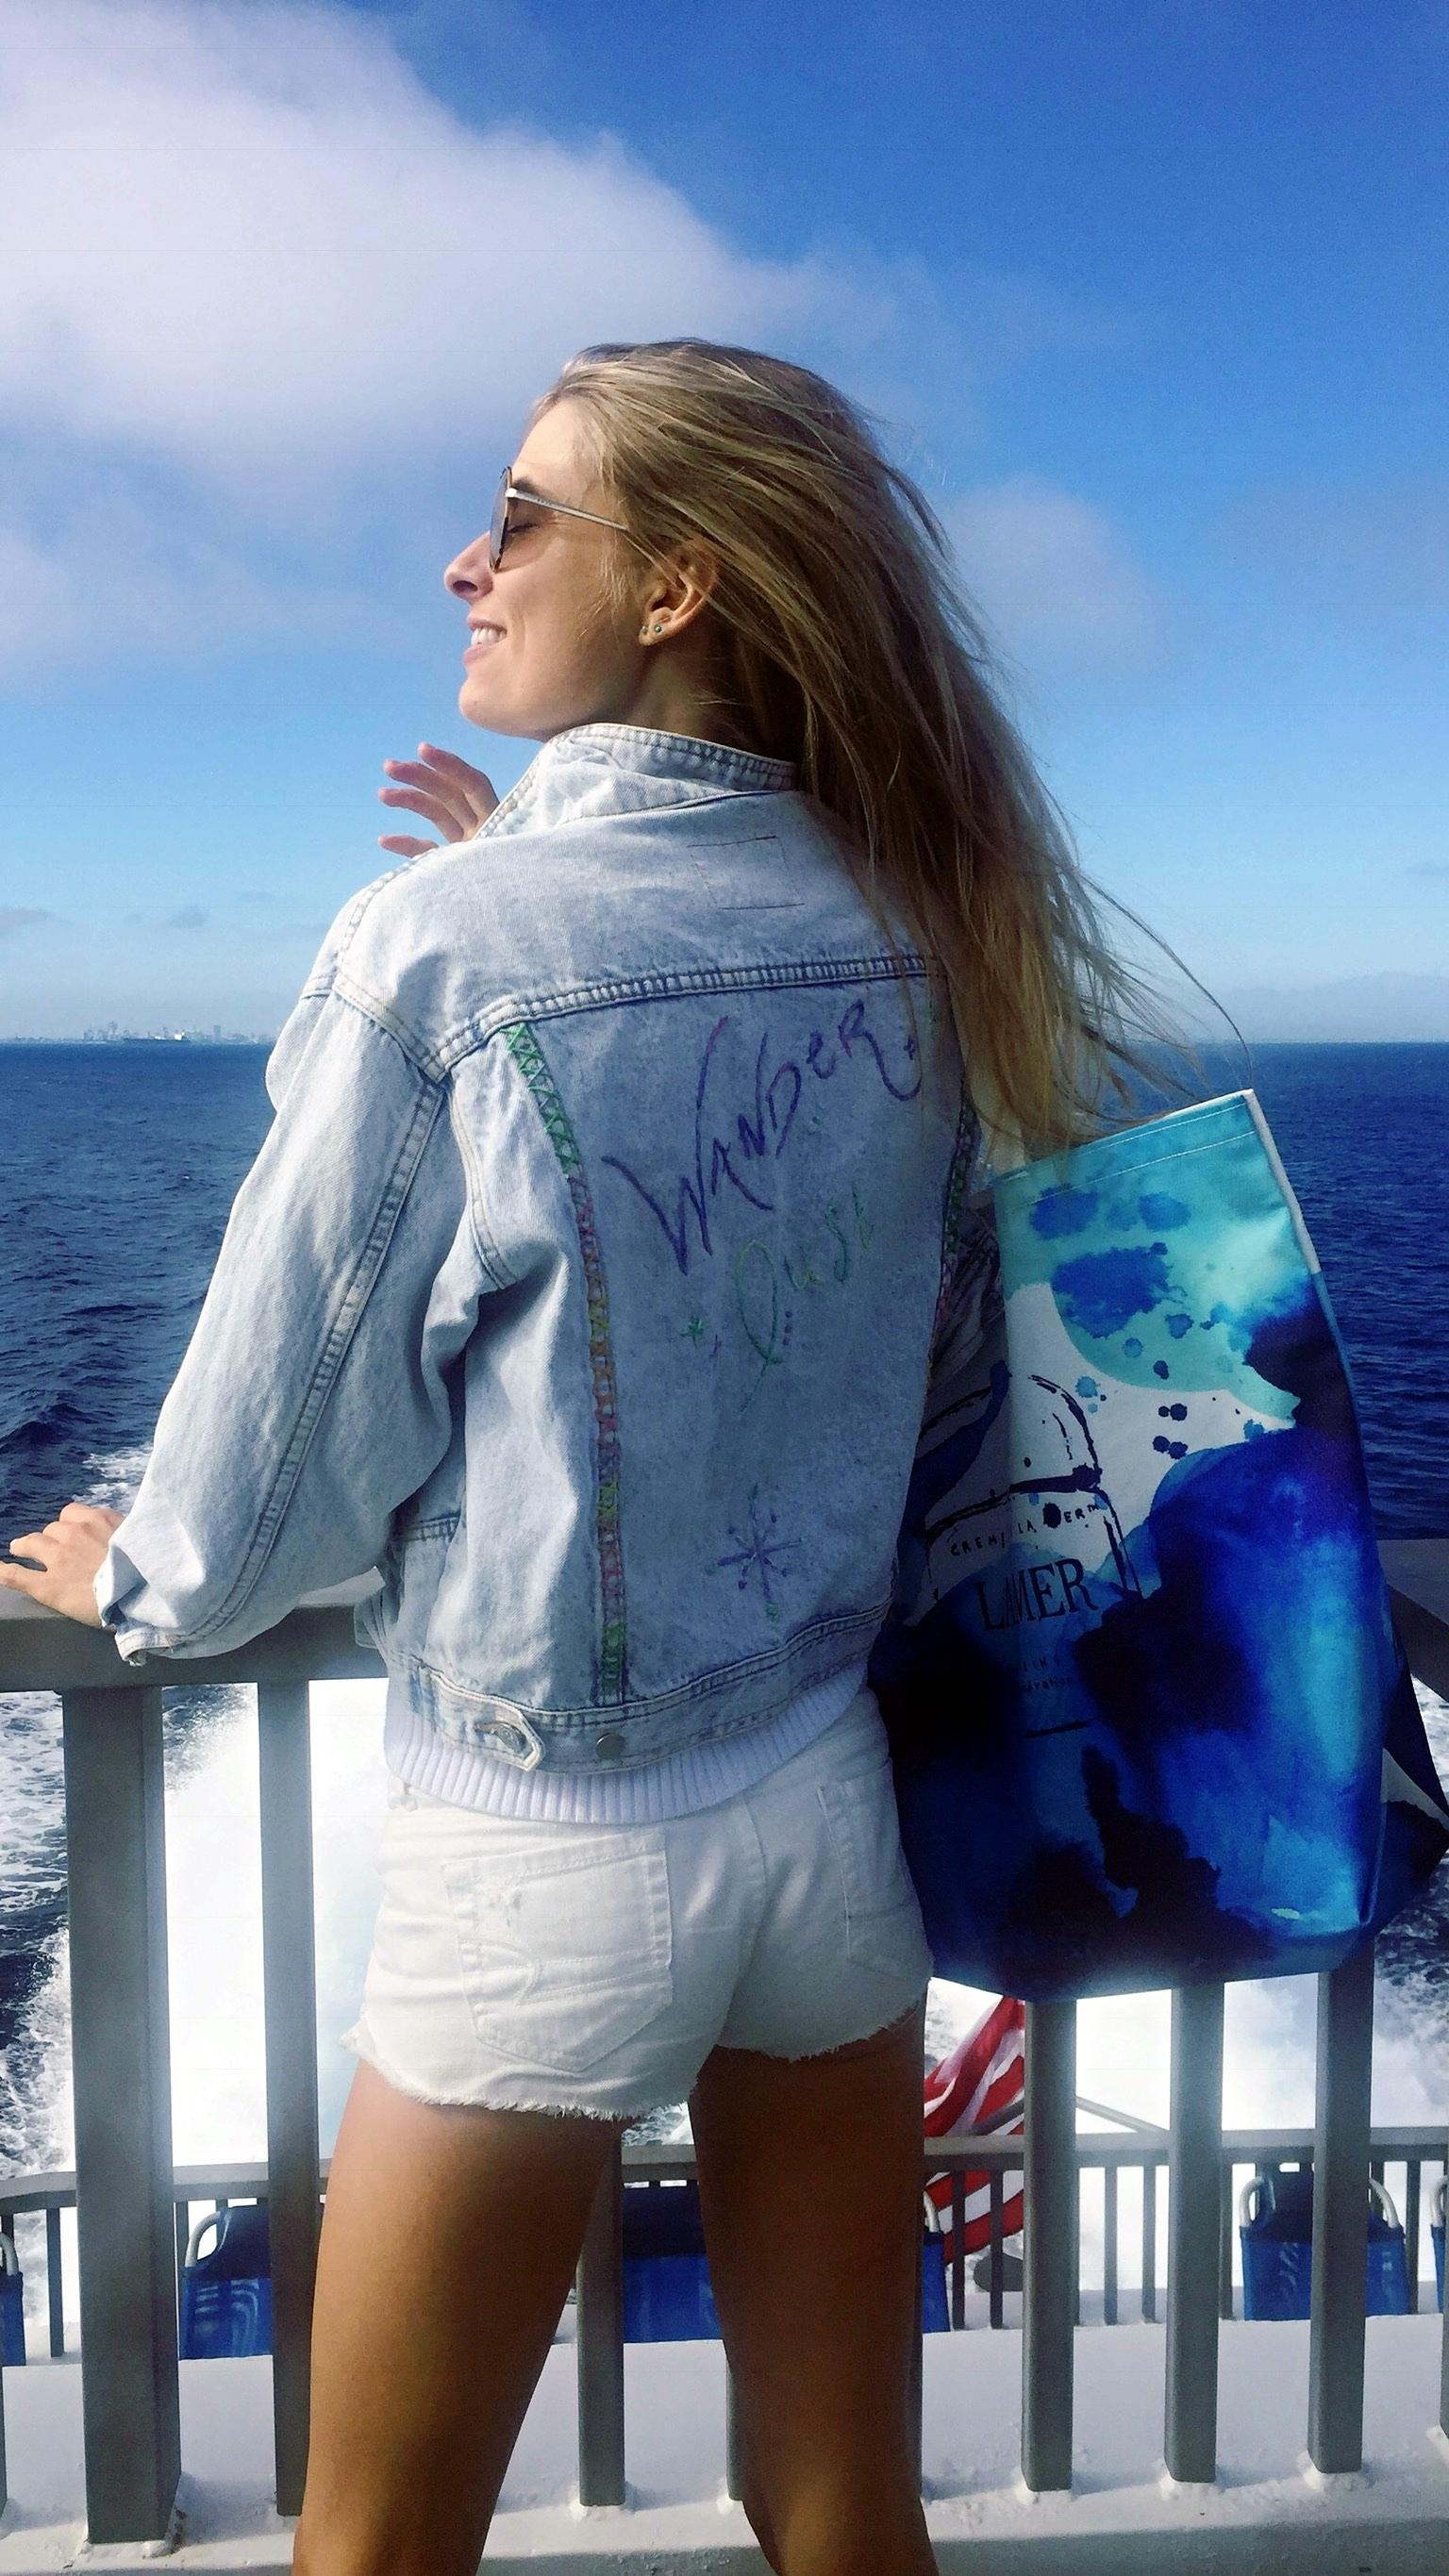 Vagablonde Embroidered Jacket $250